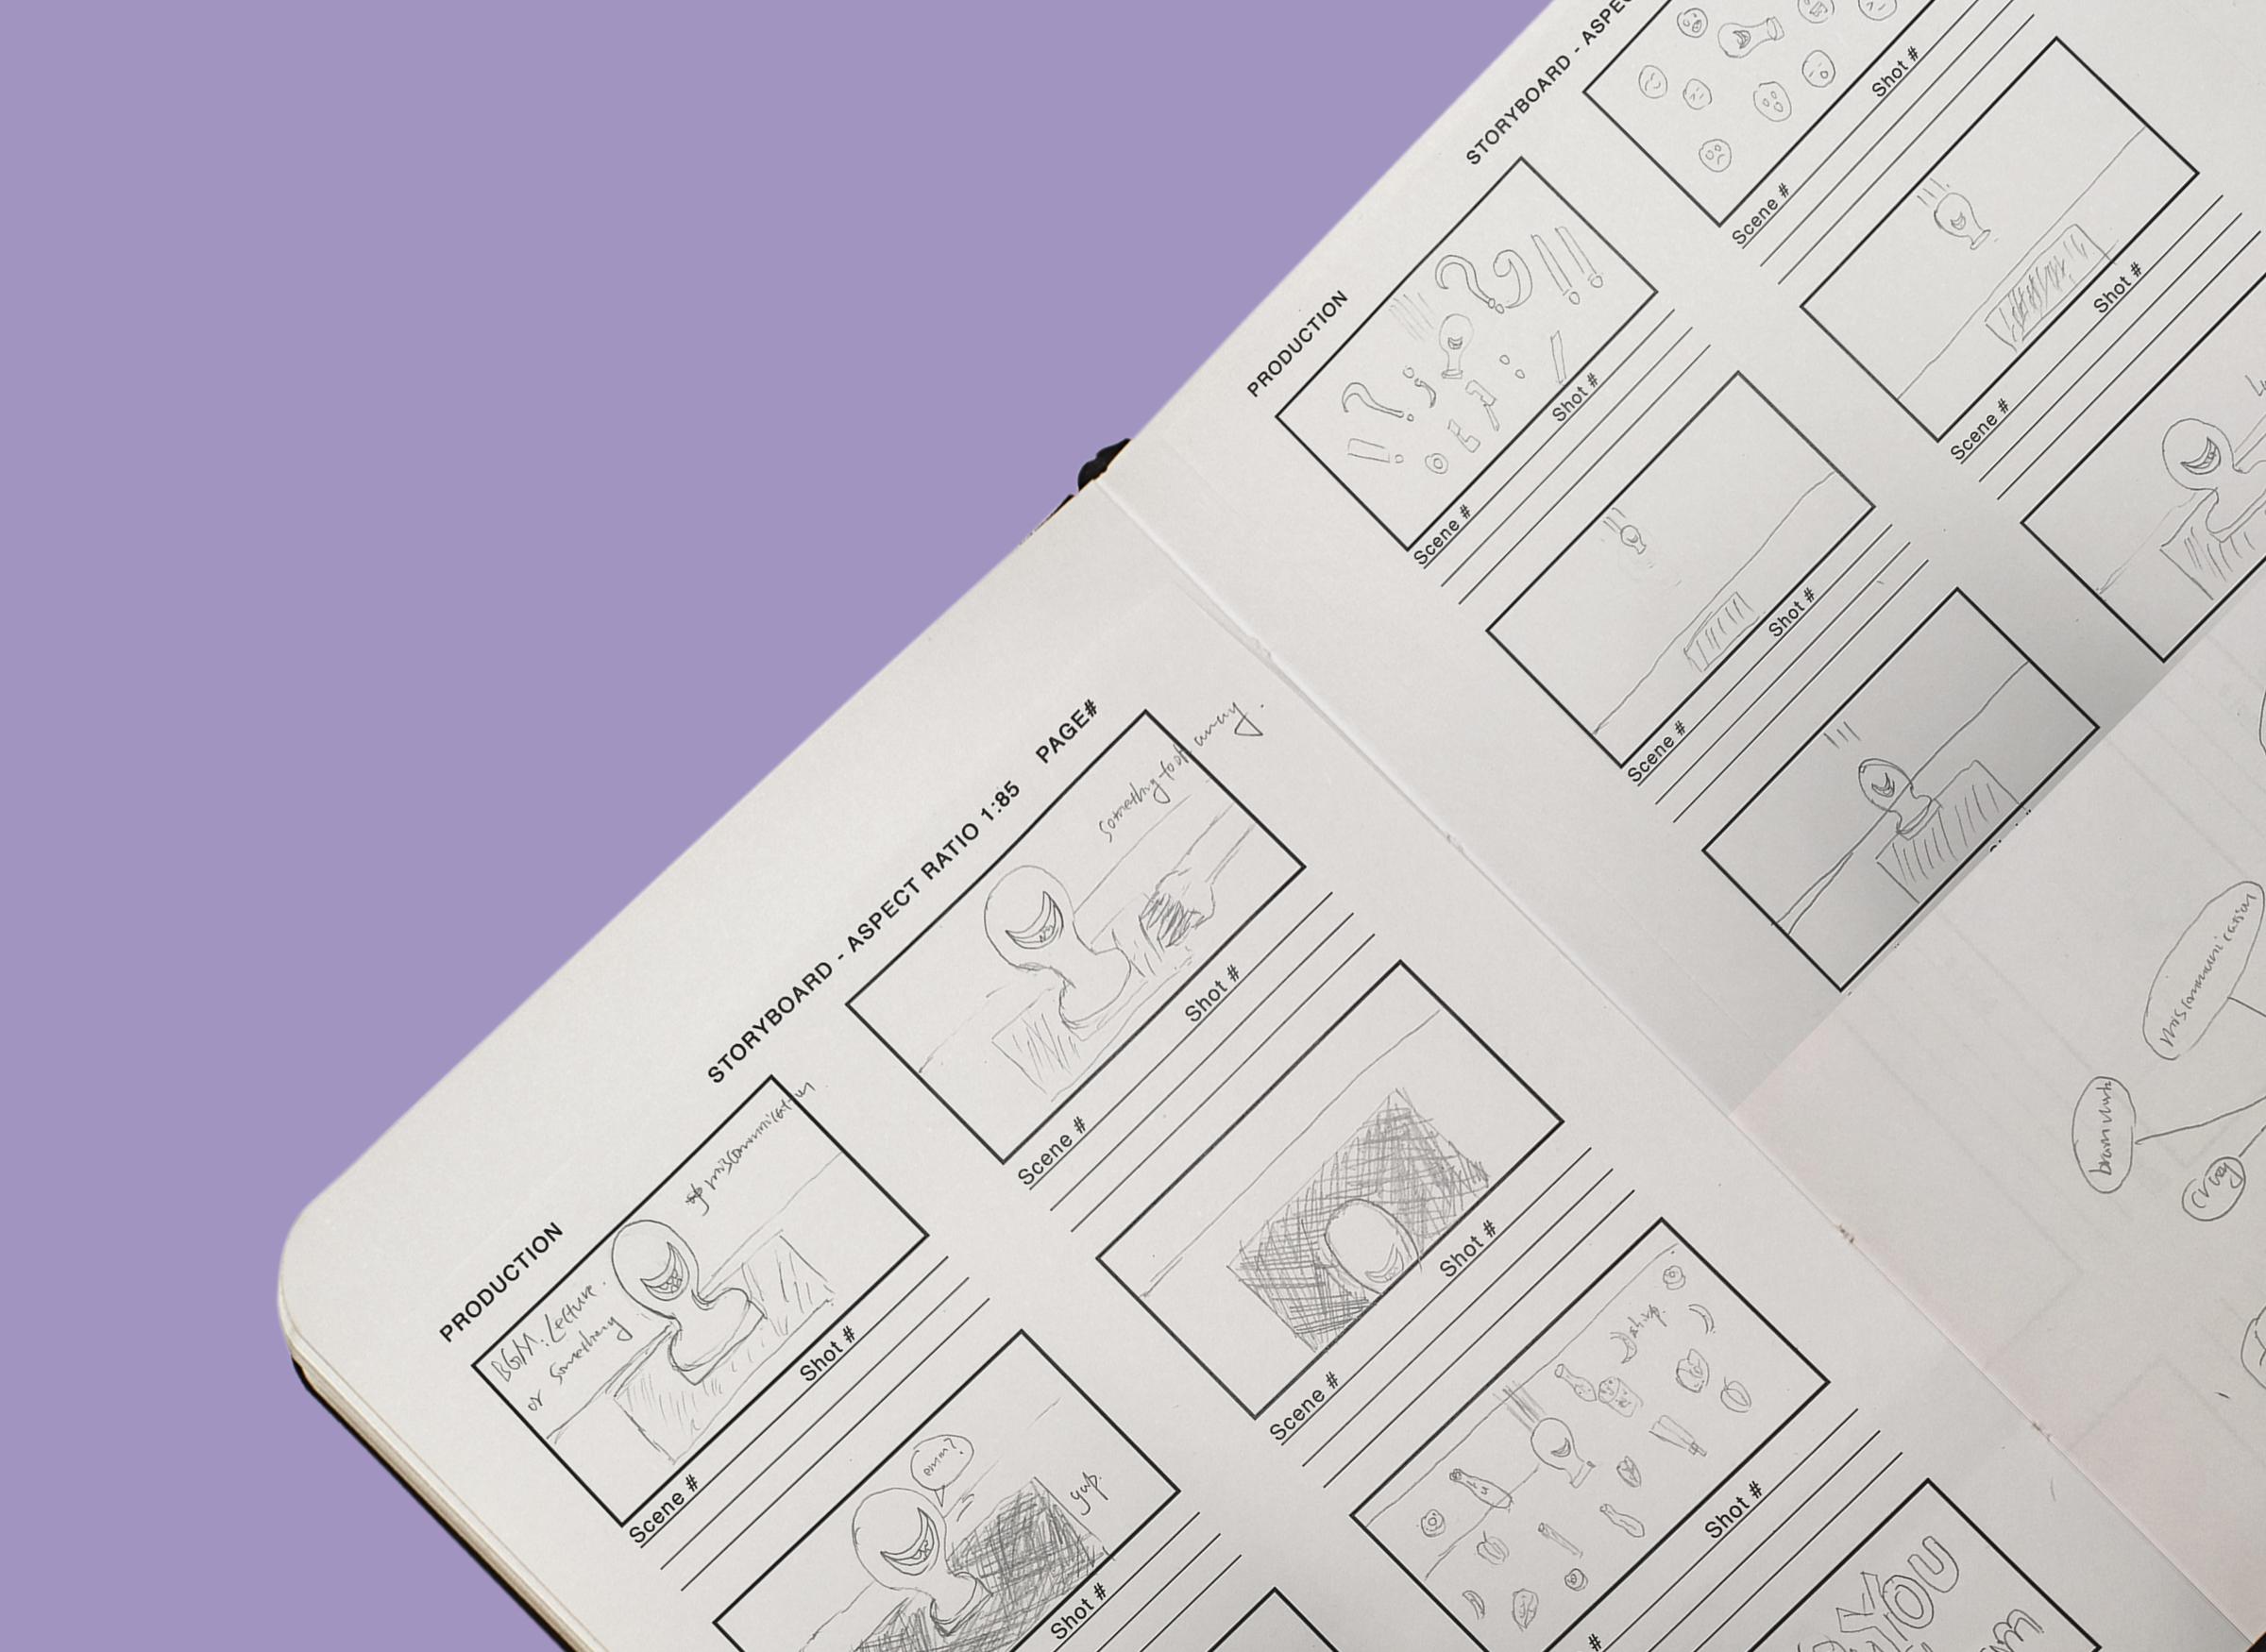 Sketchbook MockUp PSD.jpg